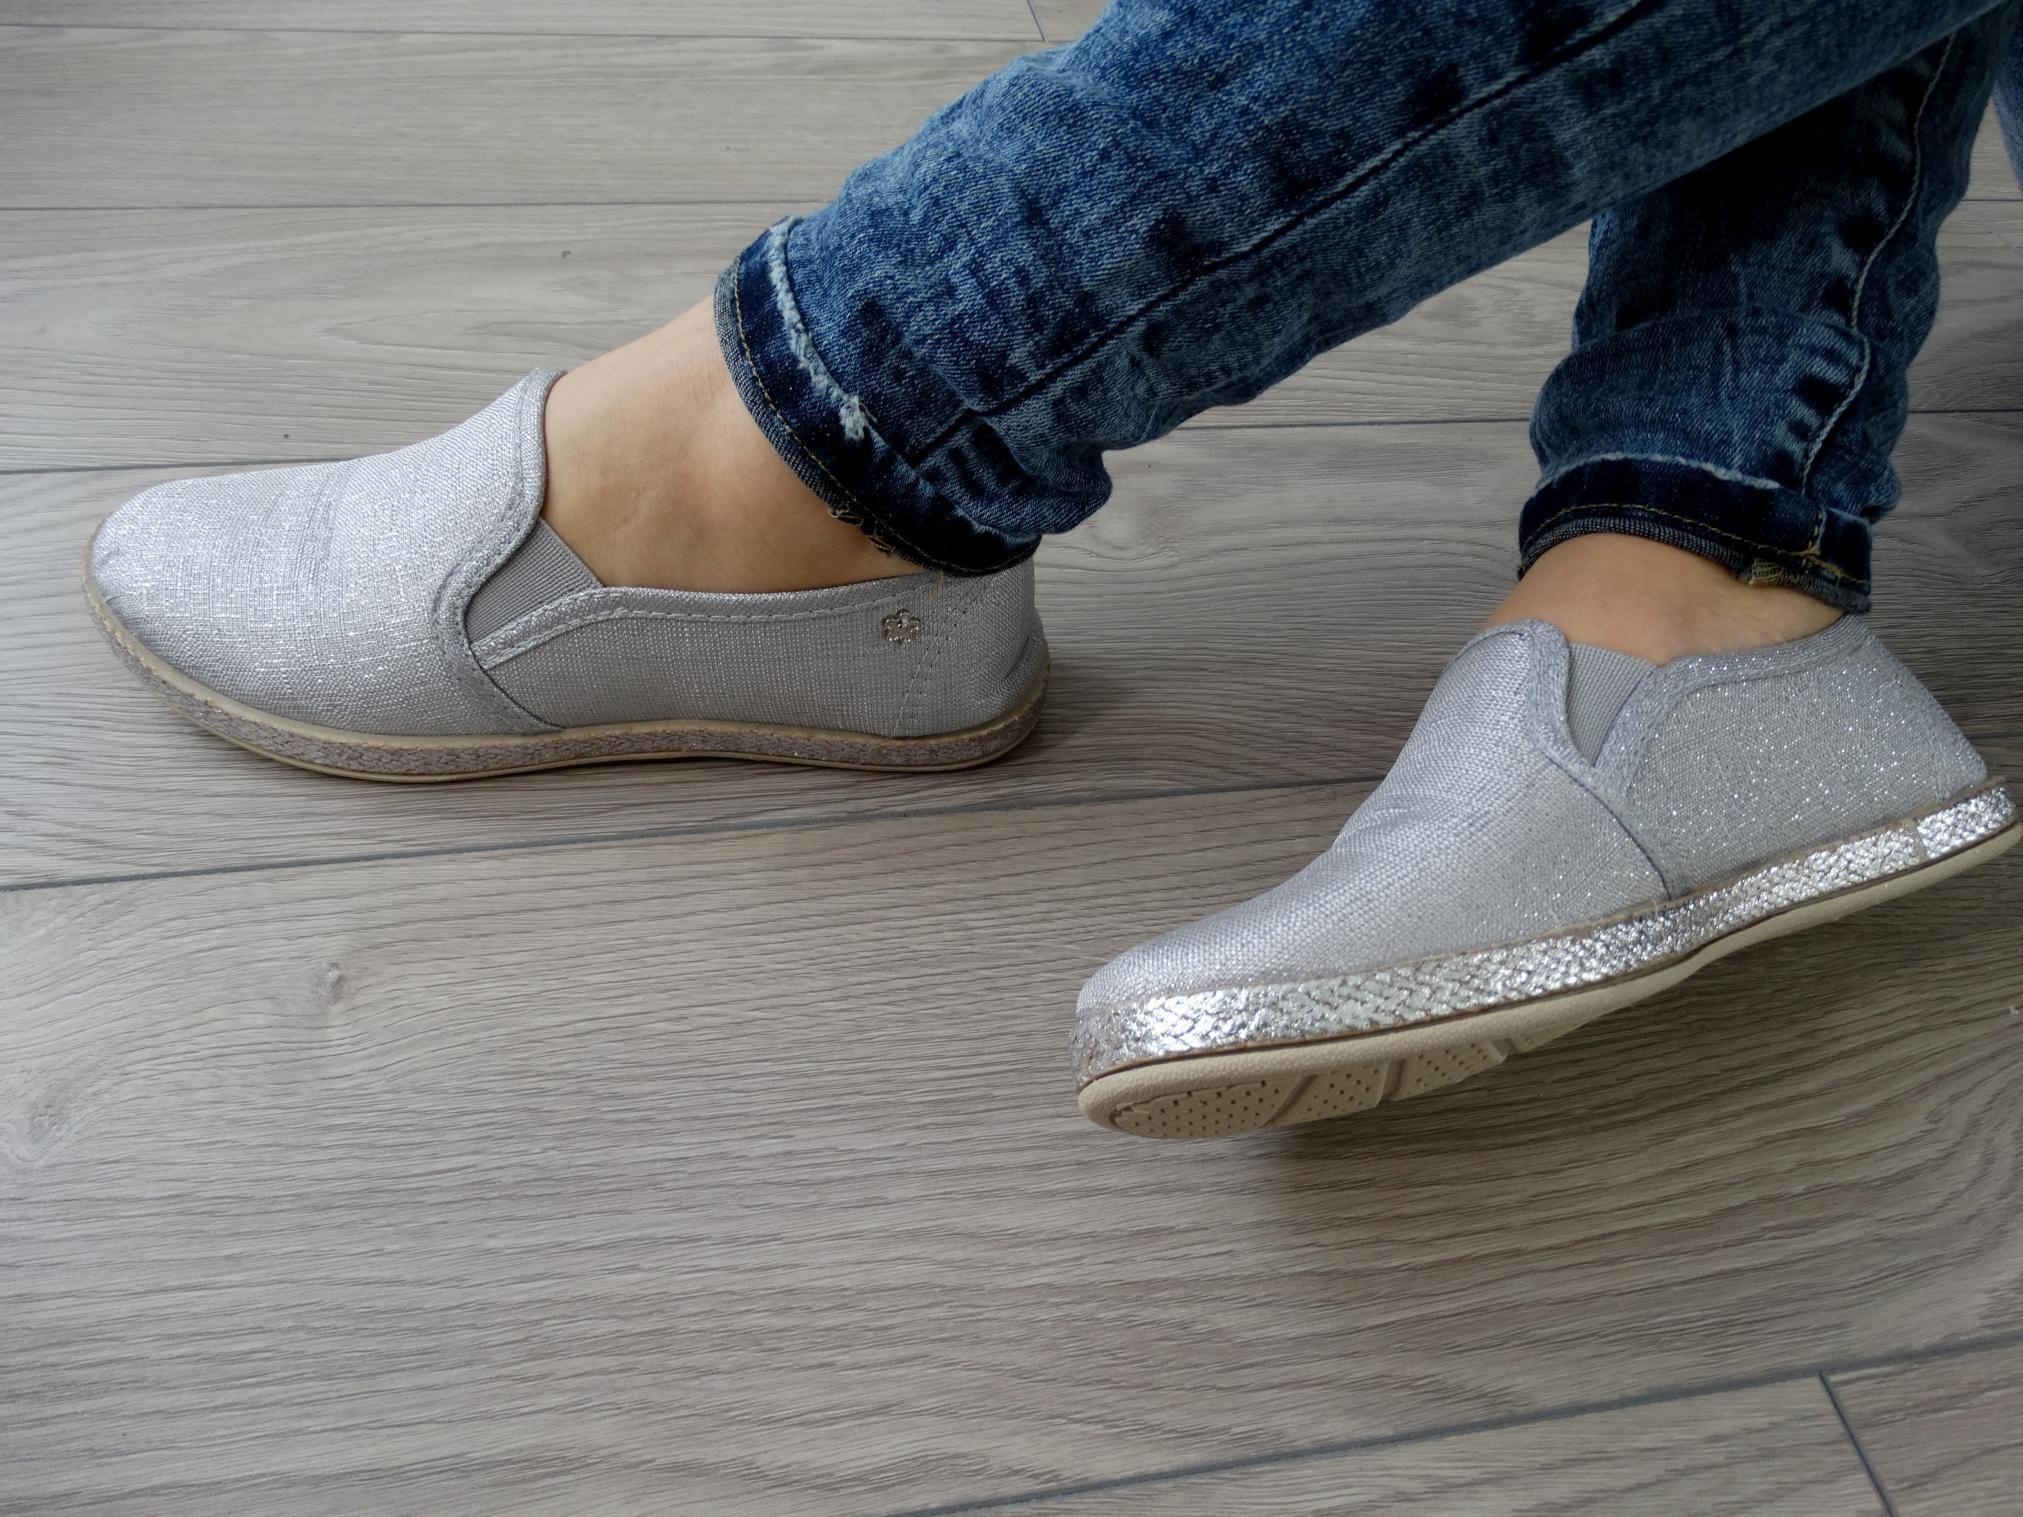 Szaro Srebrzyste Slip One 36 41 6074520791 Oficjalne Archiwum Allegro Slip On Sneaker Flat Espadrille Espadrilles